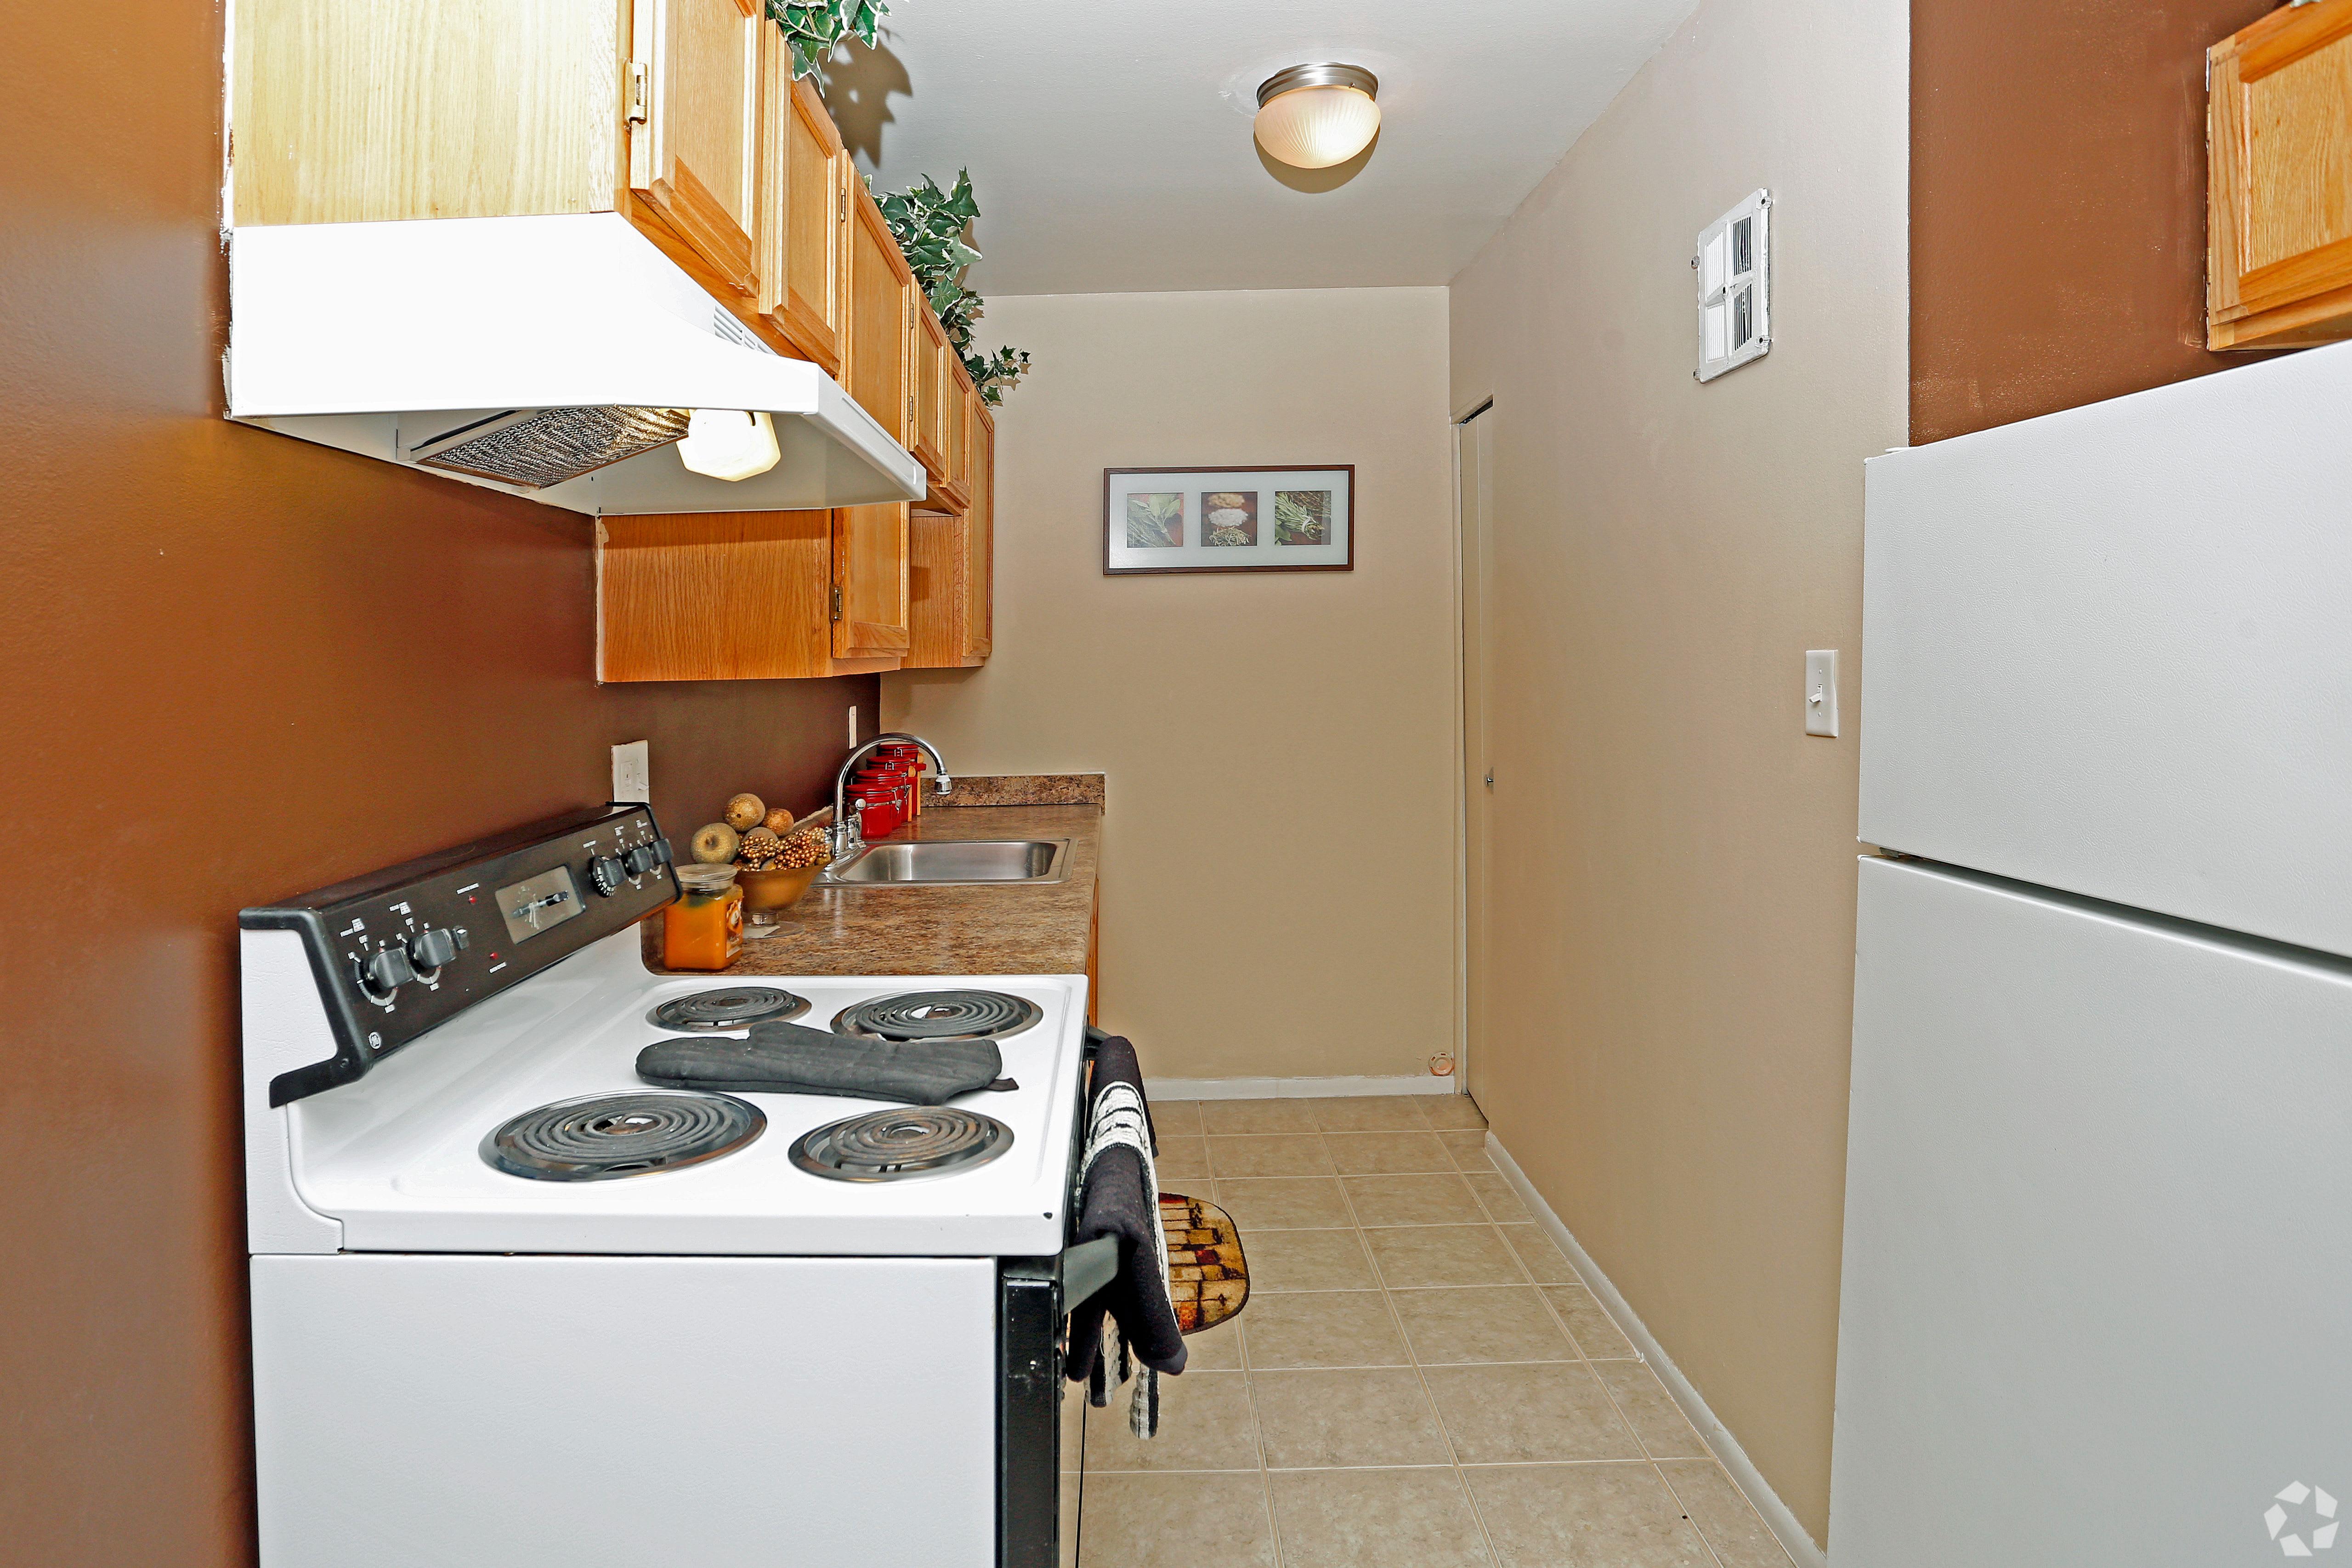 Hoover Square Apartments showcases a beautiful kitchen in Warren, Michigan